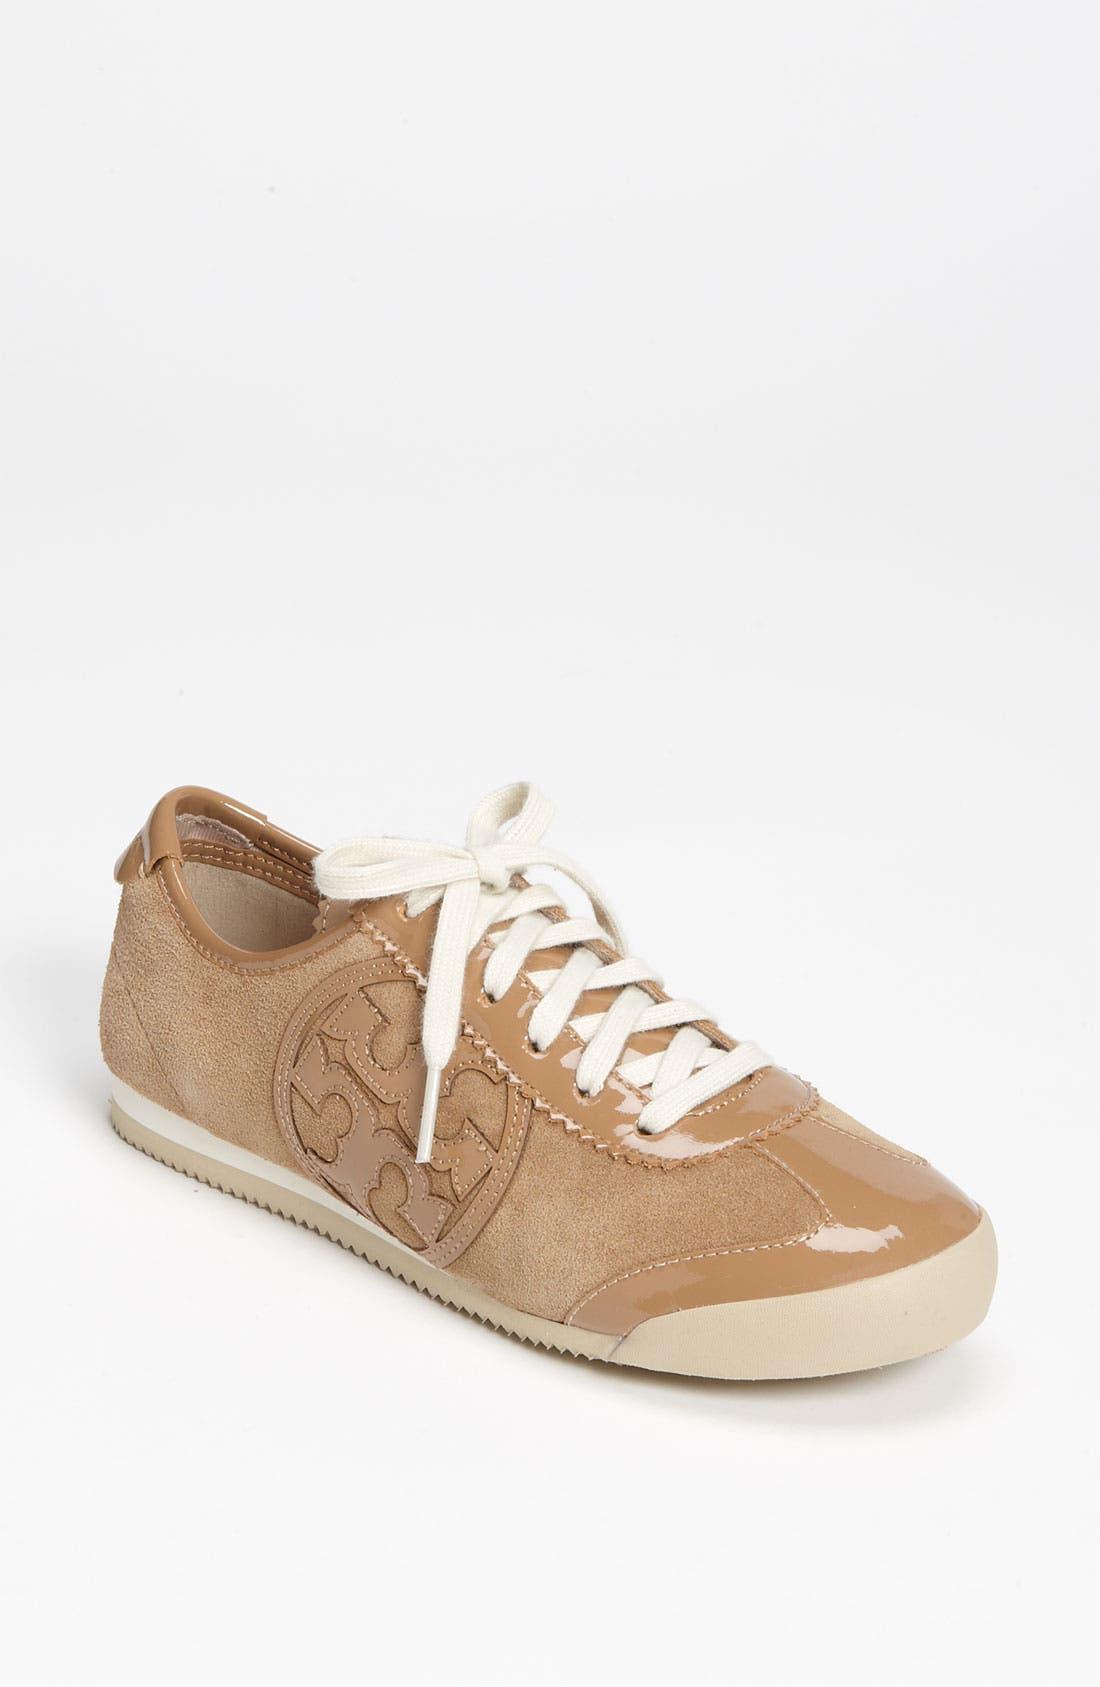 Main Image - Tory Burch 'Murphey' Split Suede Sneaker